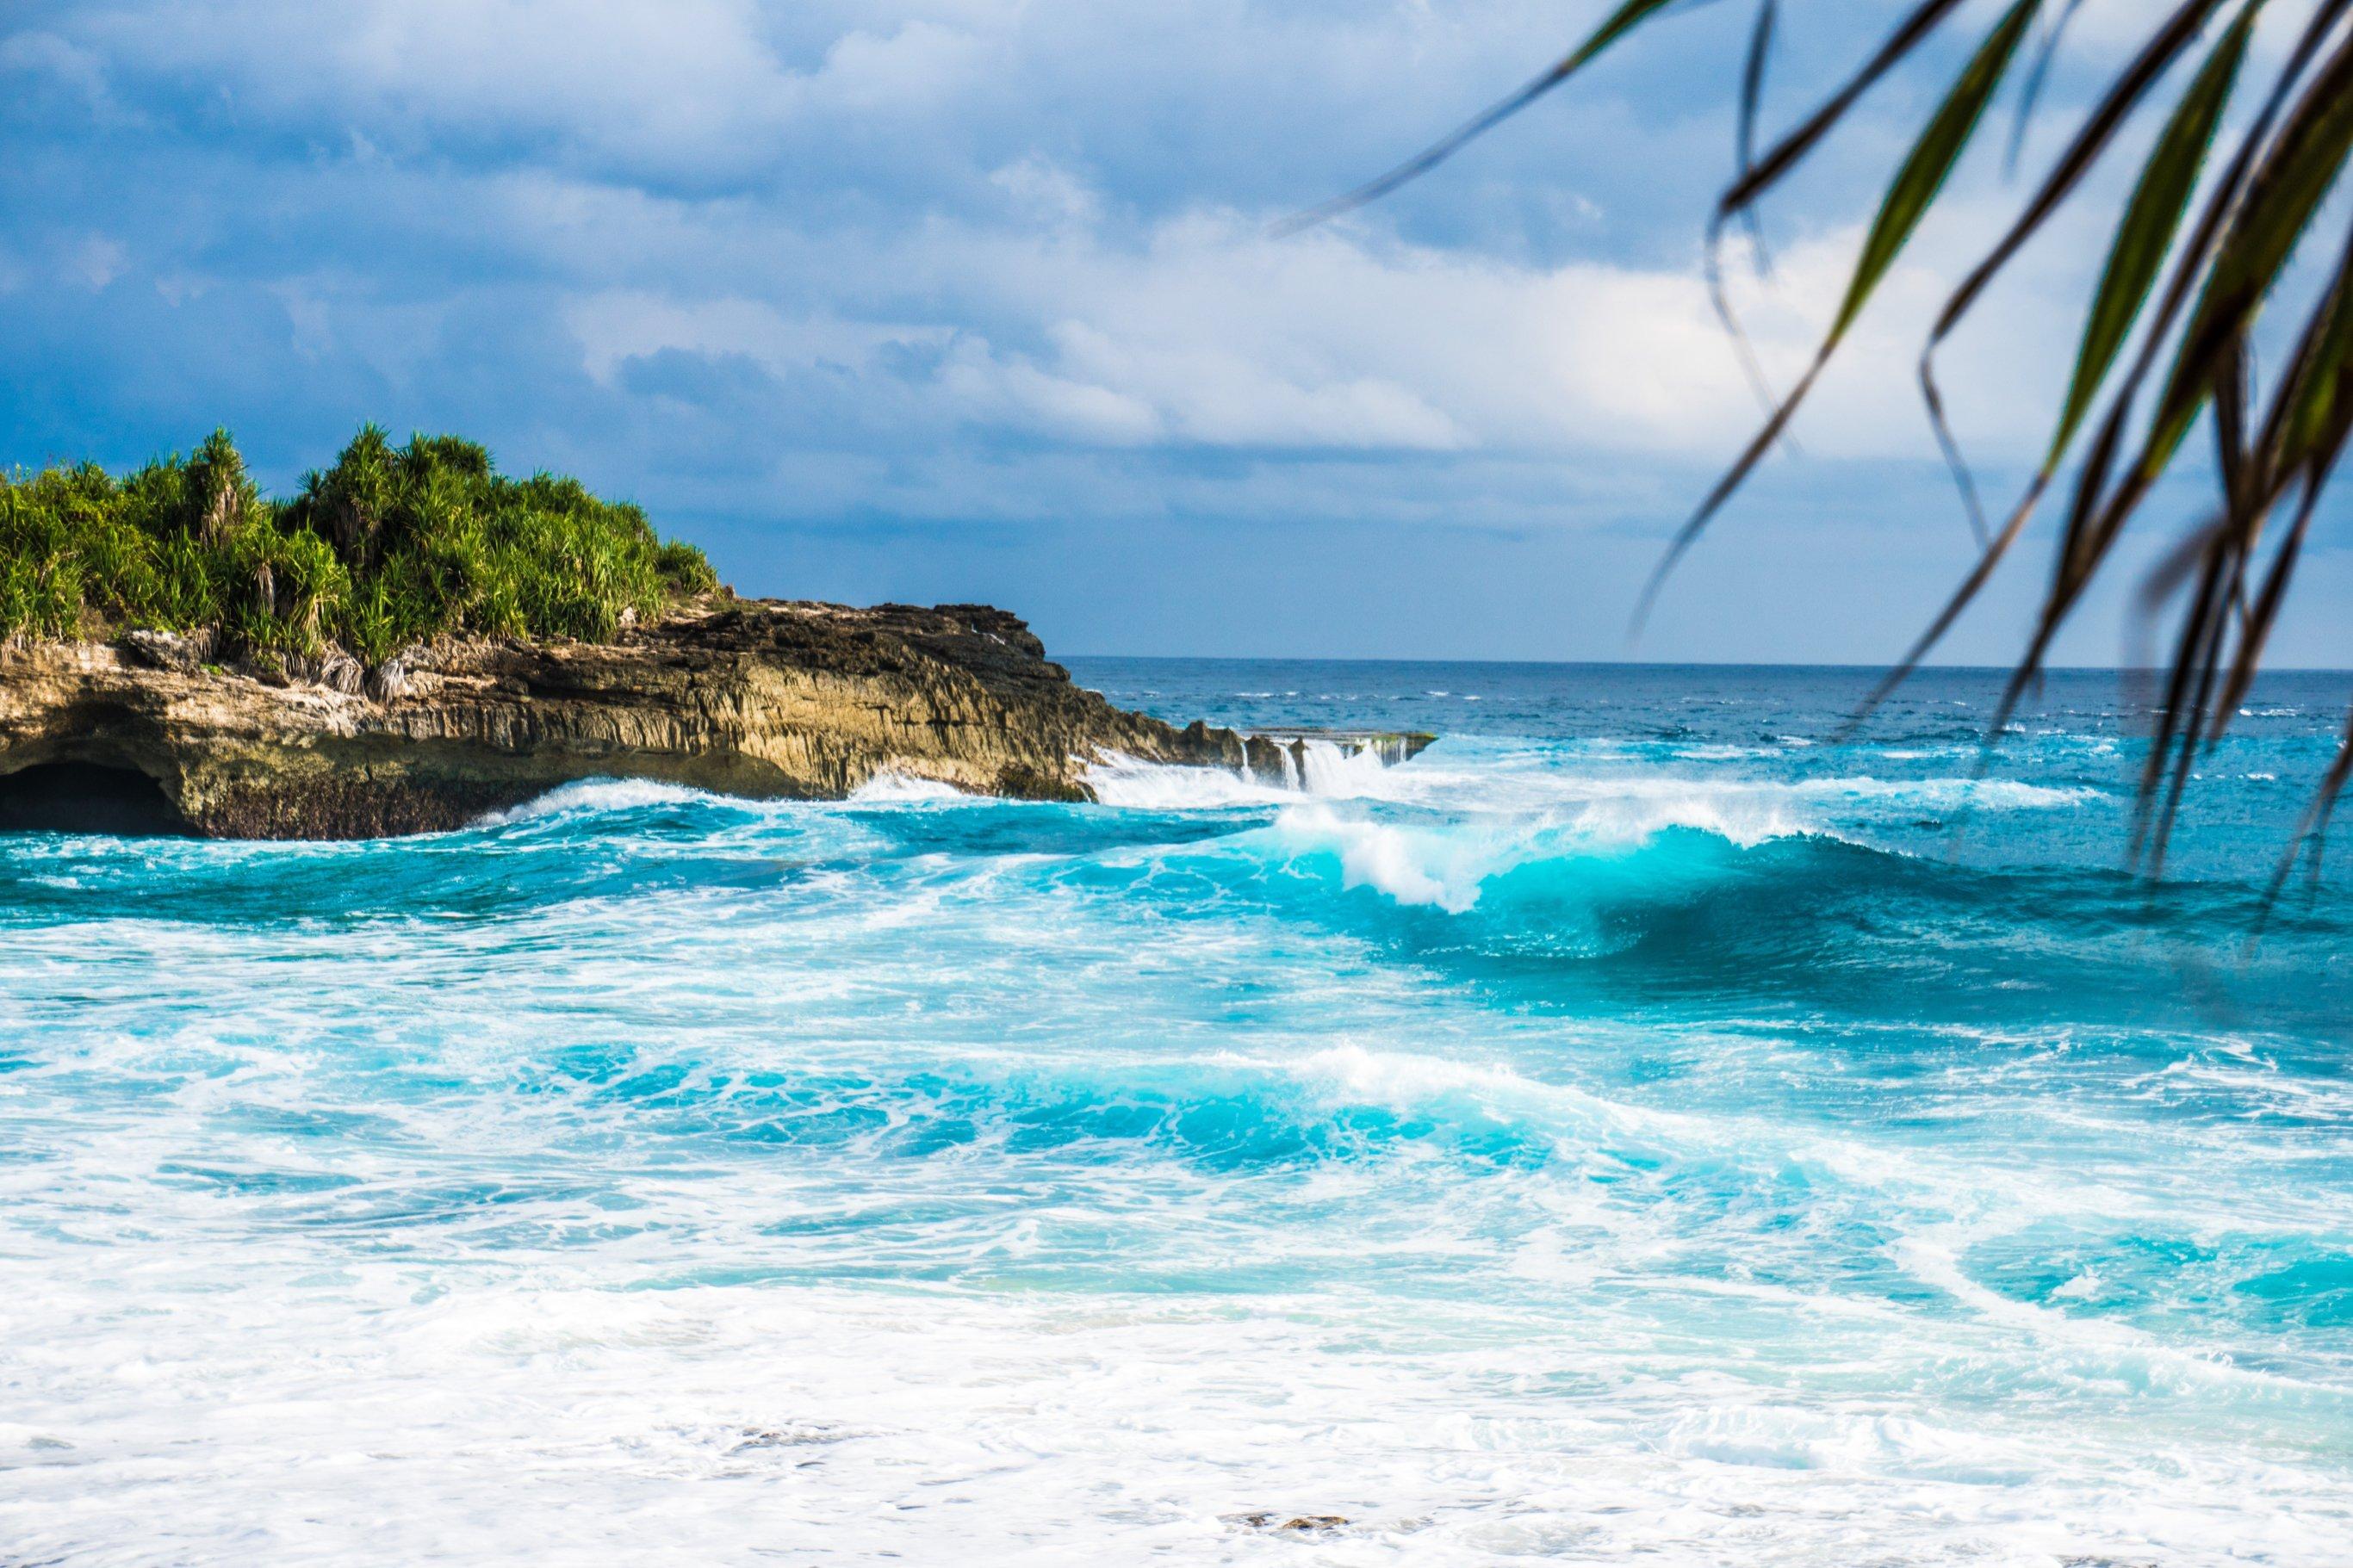 2-Day Nusa Lembongan & Nusa Penida Tour from Bali - Indonesia Itinerary